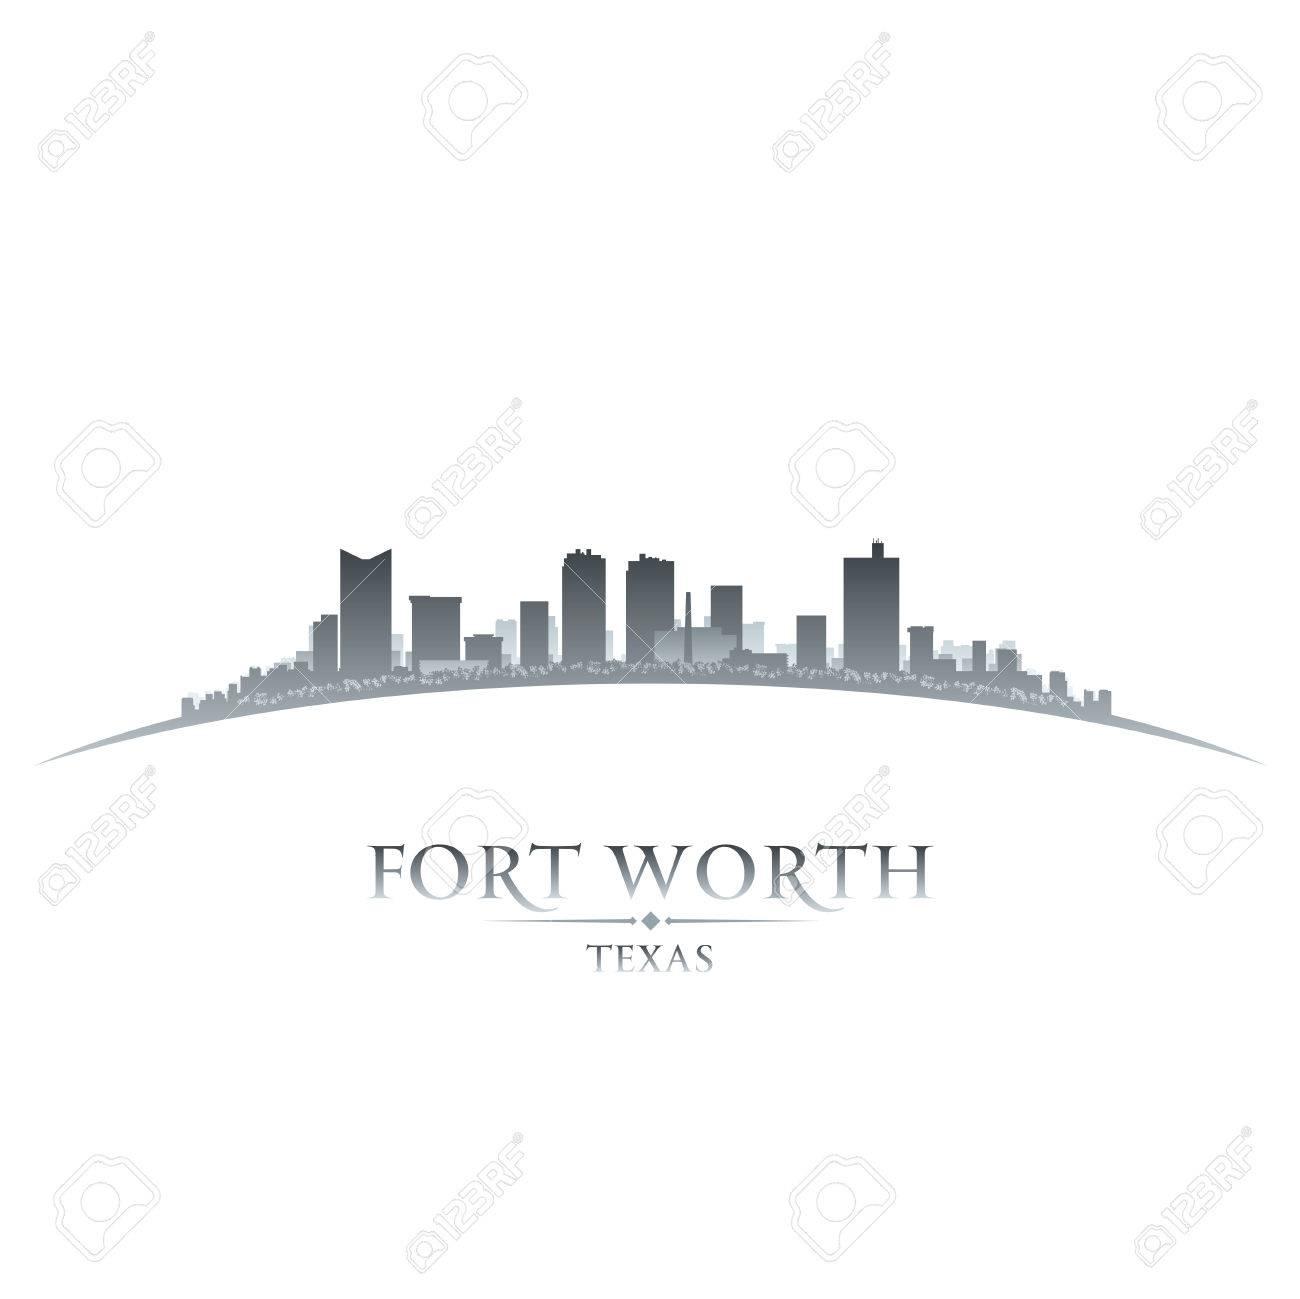 Fort Worth Texas city skyline silhouette. Vector illustration - 24697386